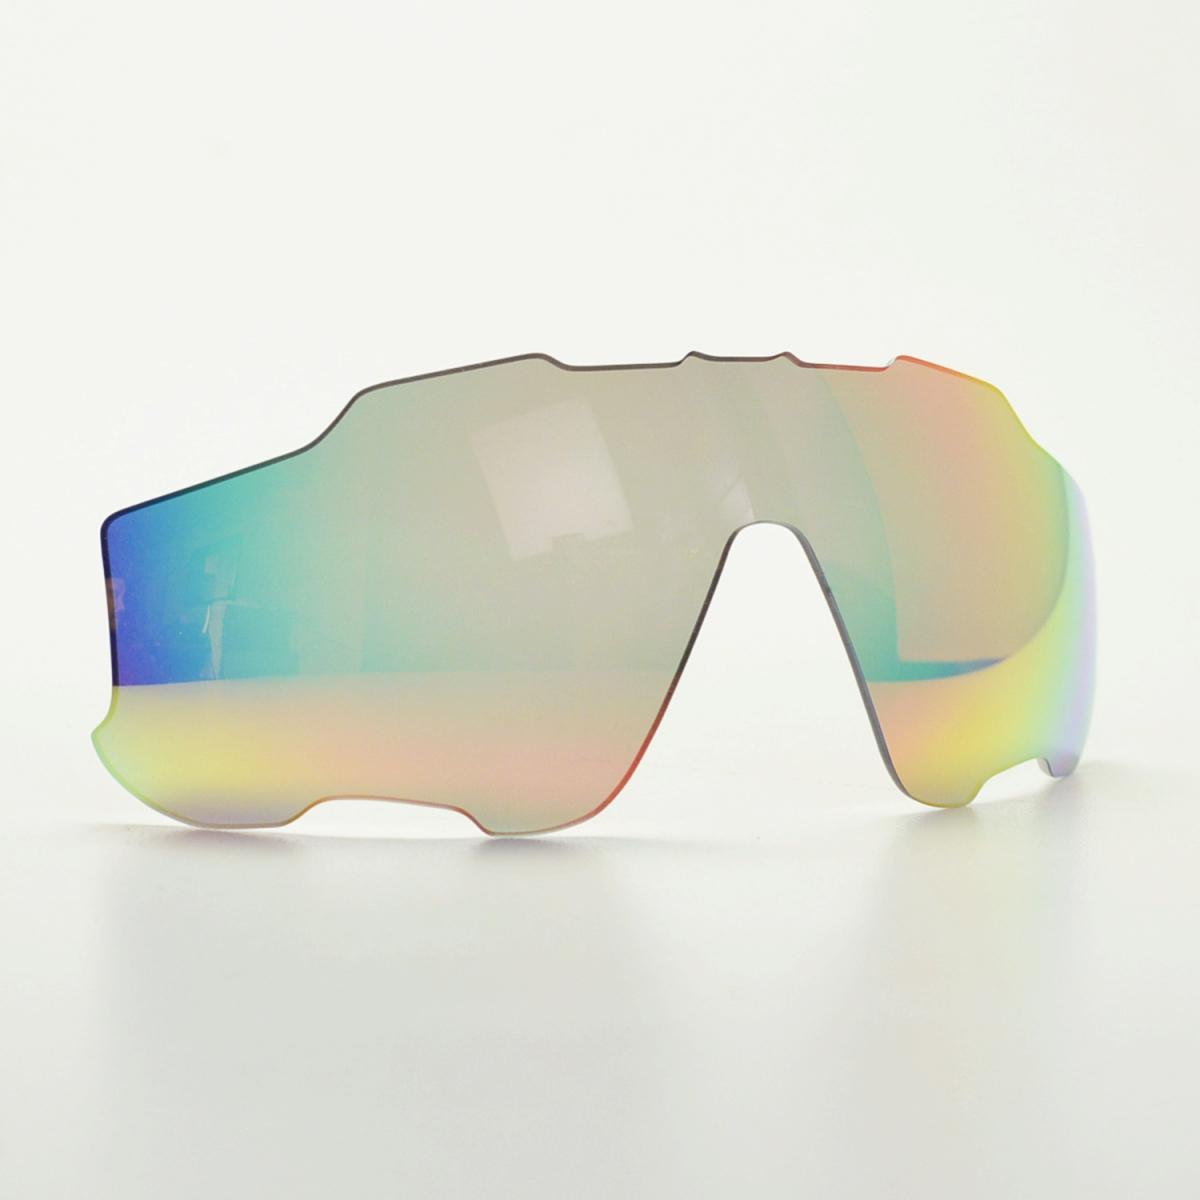 GOODMAN LENS MANUFACTURE グッドマンレンズマニュファクチュア JAWBREAKER用交換レンズ 偏光ライトグレー レッドミラーGOODMAN LENS MANUFACTURE グッドマンレンズマニュファクチュア レンズ 調光 偏光 OAKLEY オークリー 交換レンズ